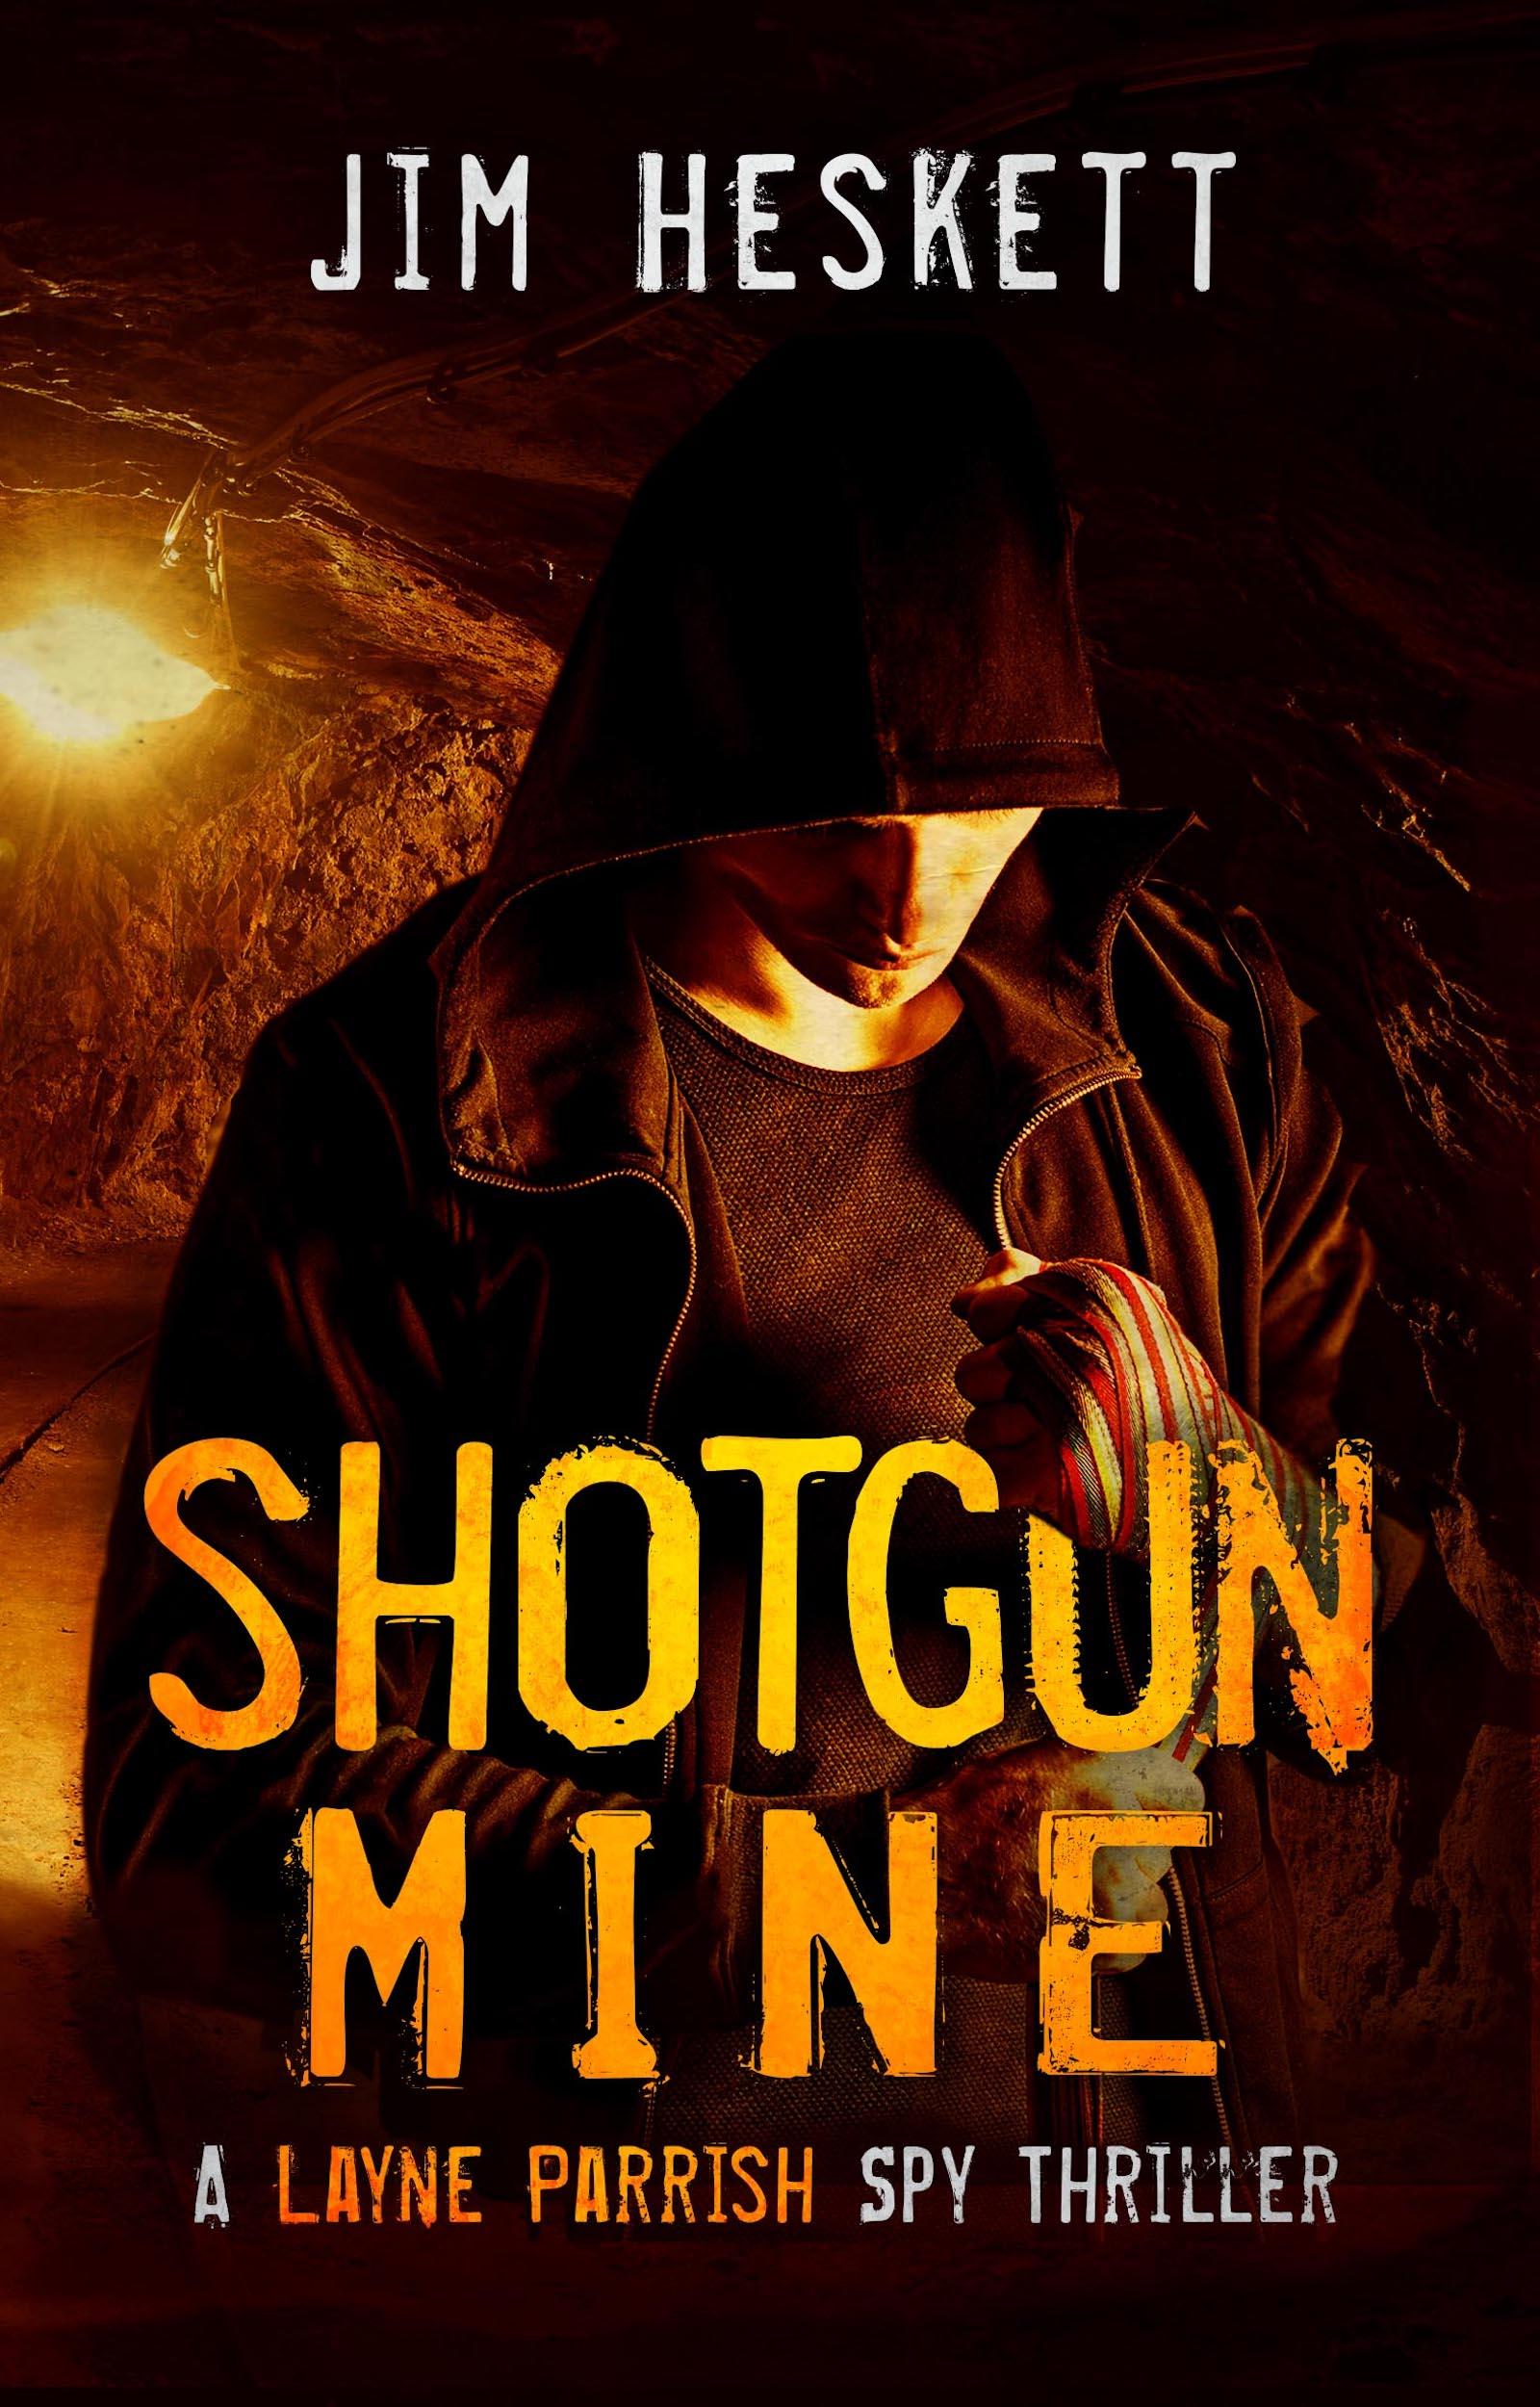 [PDF] [EPUB] Shotgun Mine (Layne Parrish #6) Download by Jim Heskett